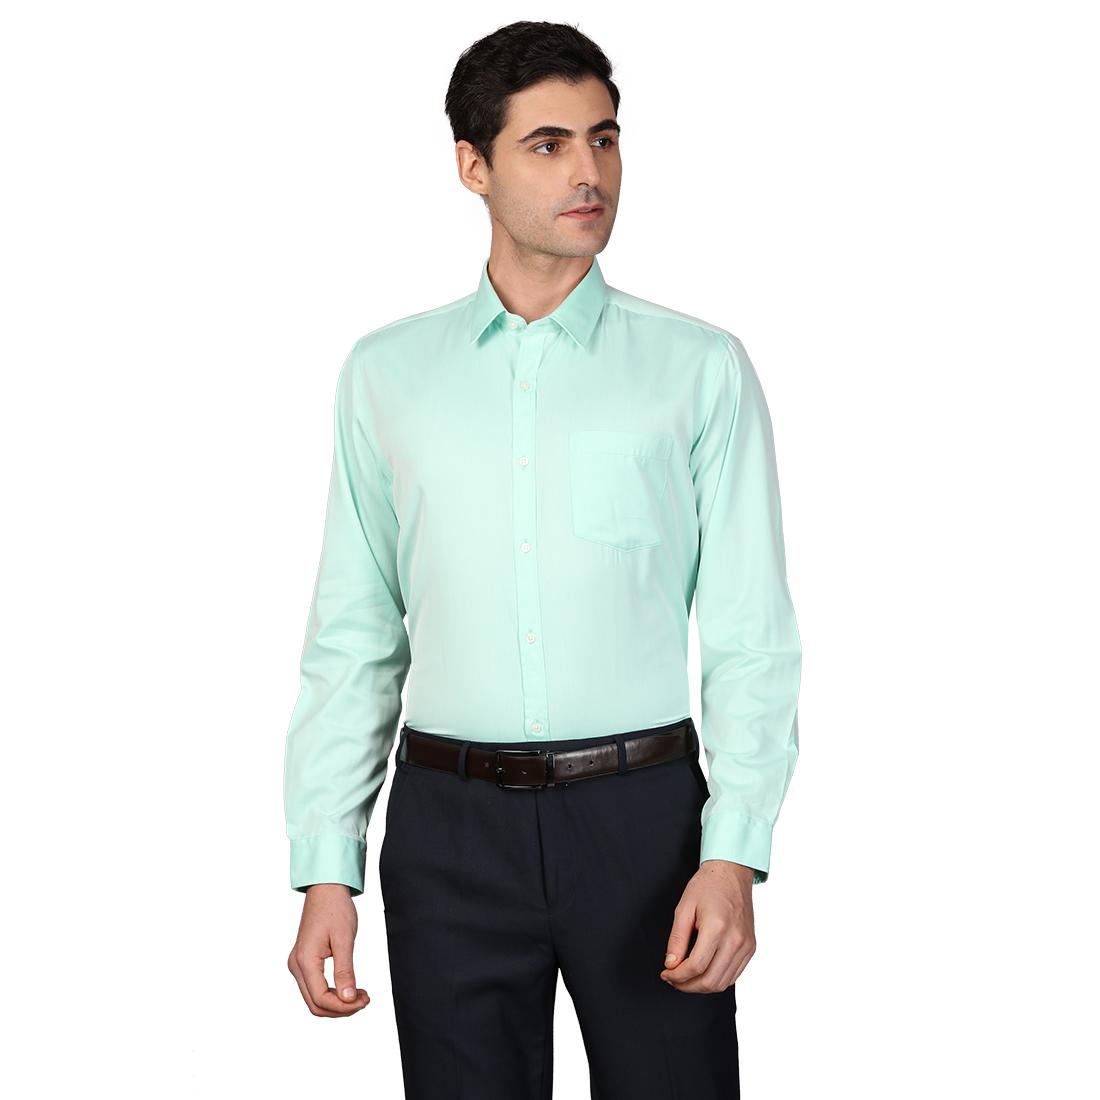 Next Look | Next Look Medium Green Shirt